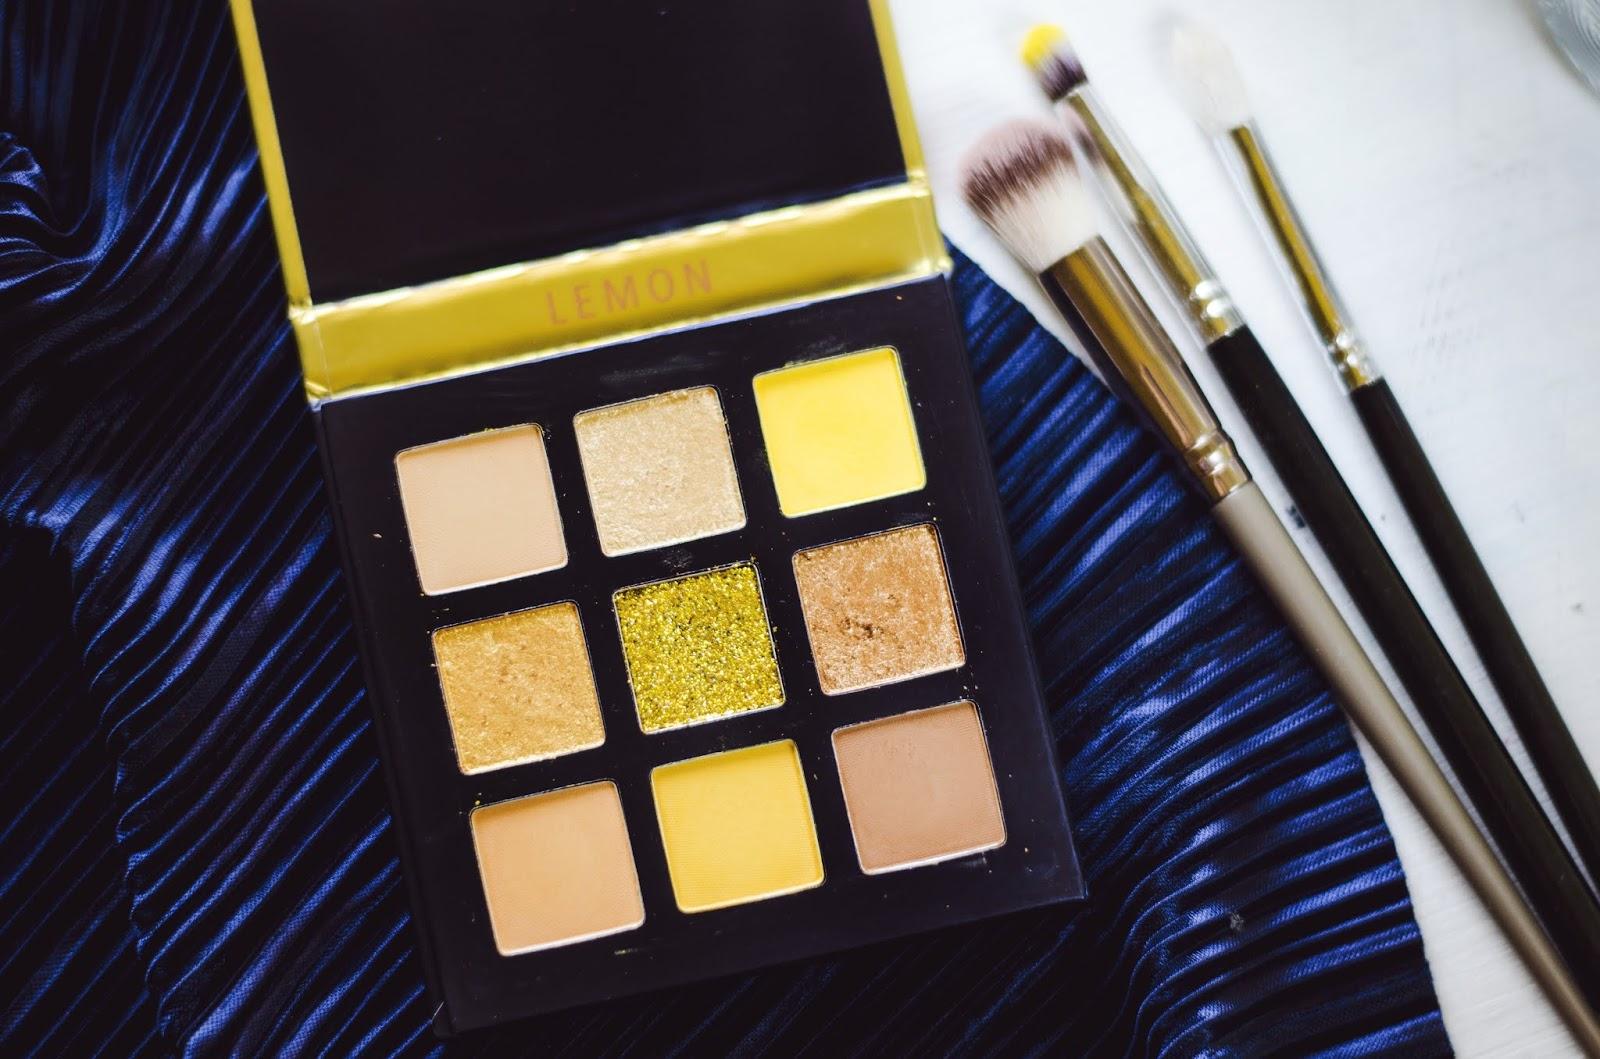 Beauty Glazed yellow LEMON eyeshadow palette highly pigmented glitter